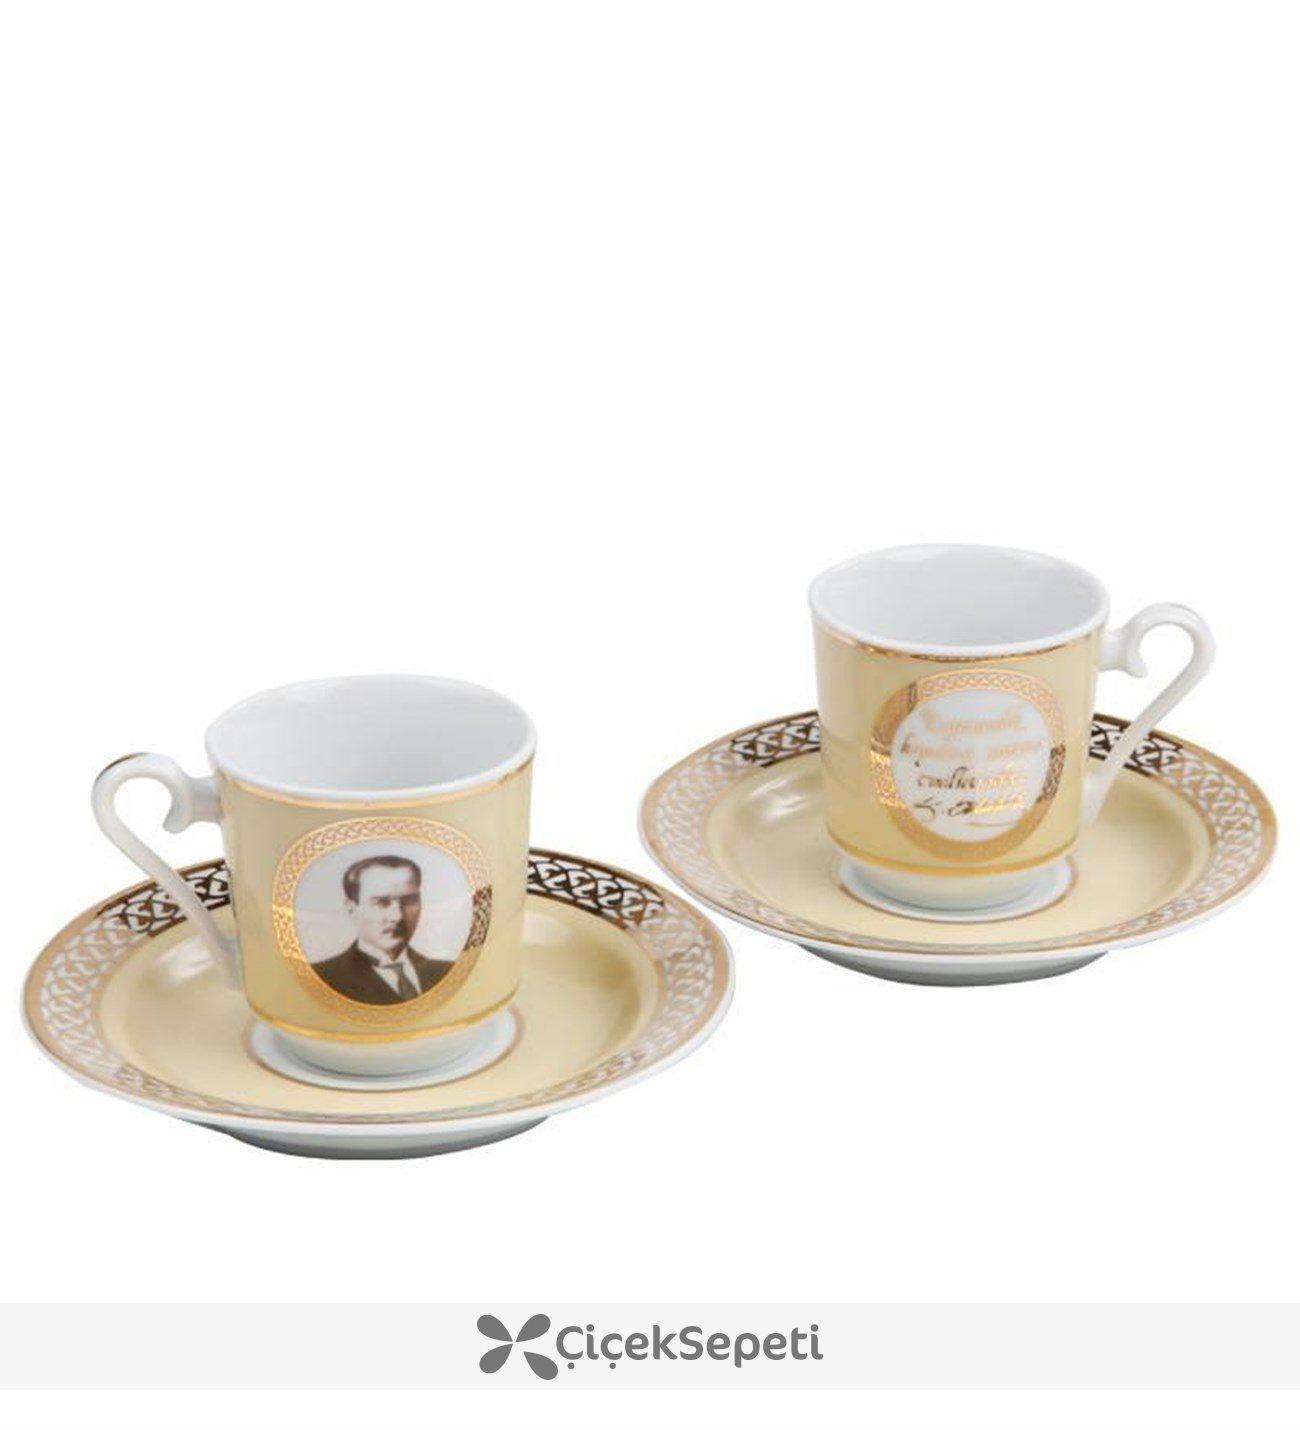 Farkli-porselen-takimi-porselen-kahve-seti